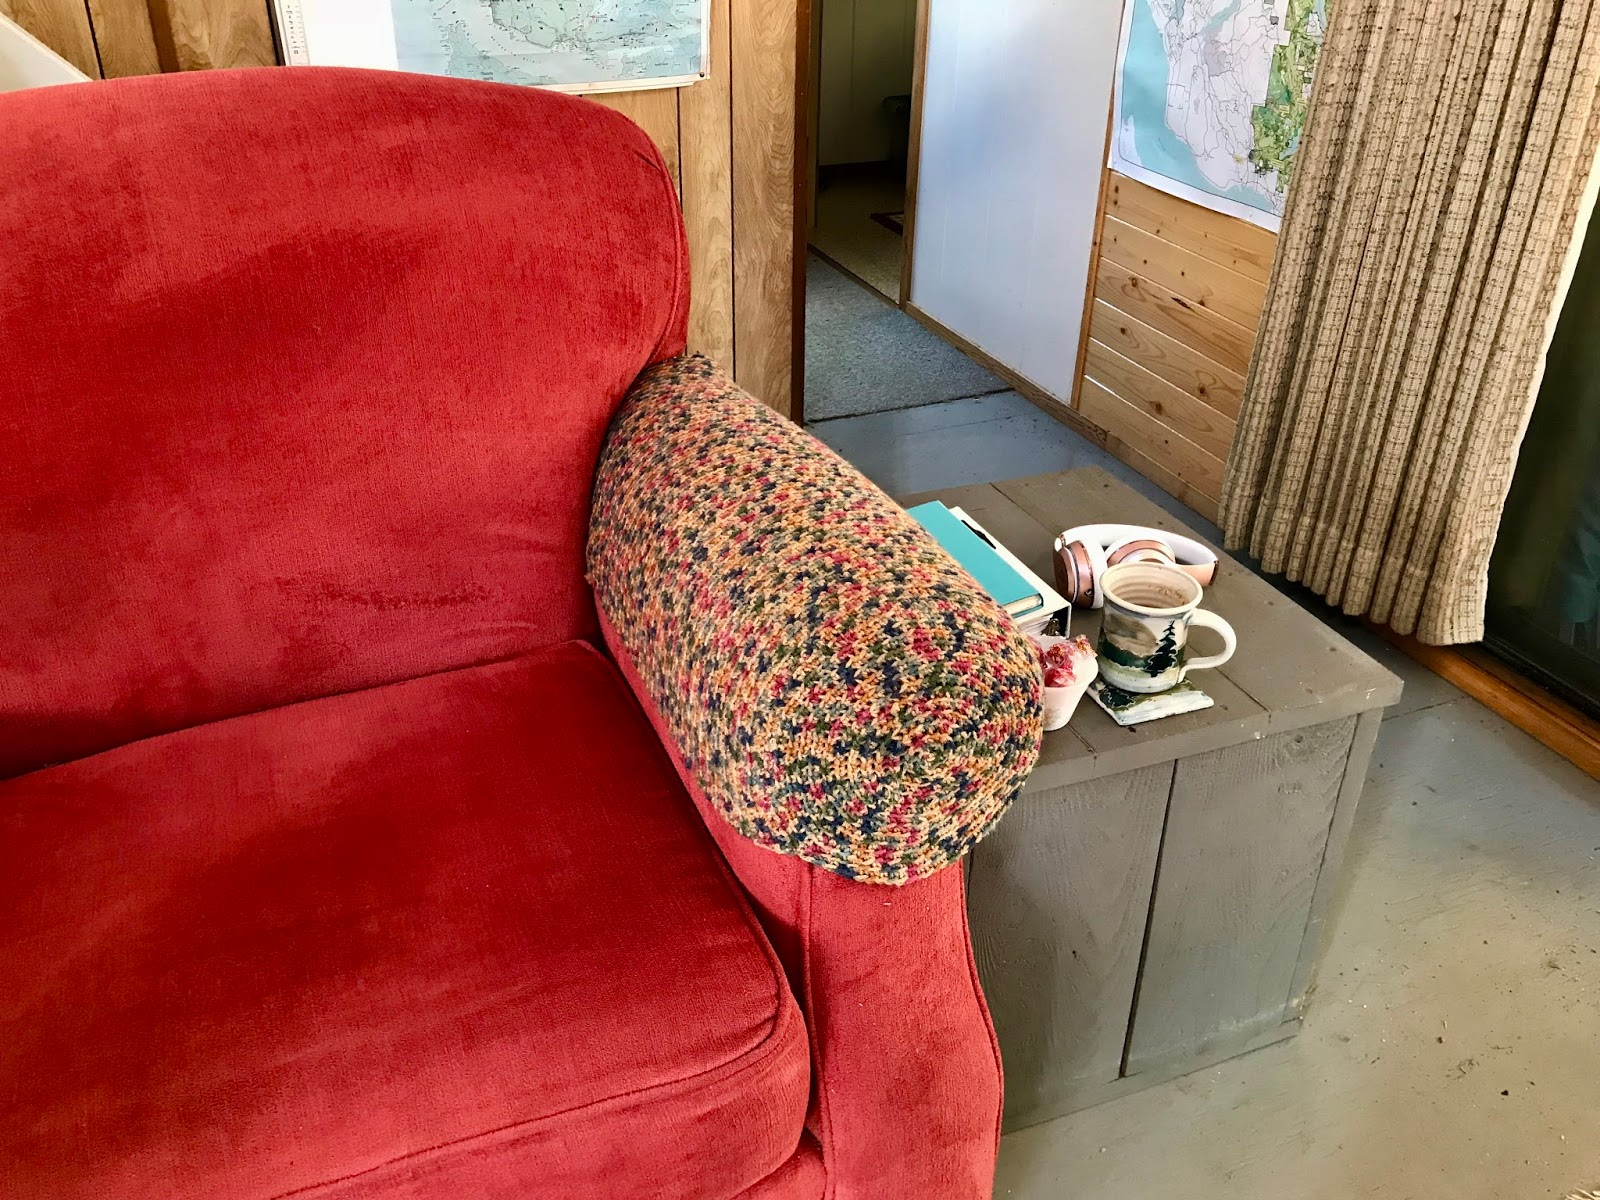 Crochet Sofa Arm Covers Bed Furniture Powell River Books Blog Armrest